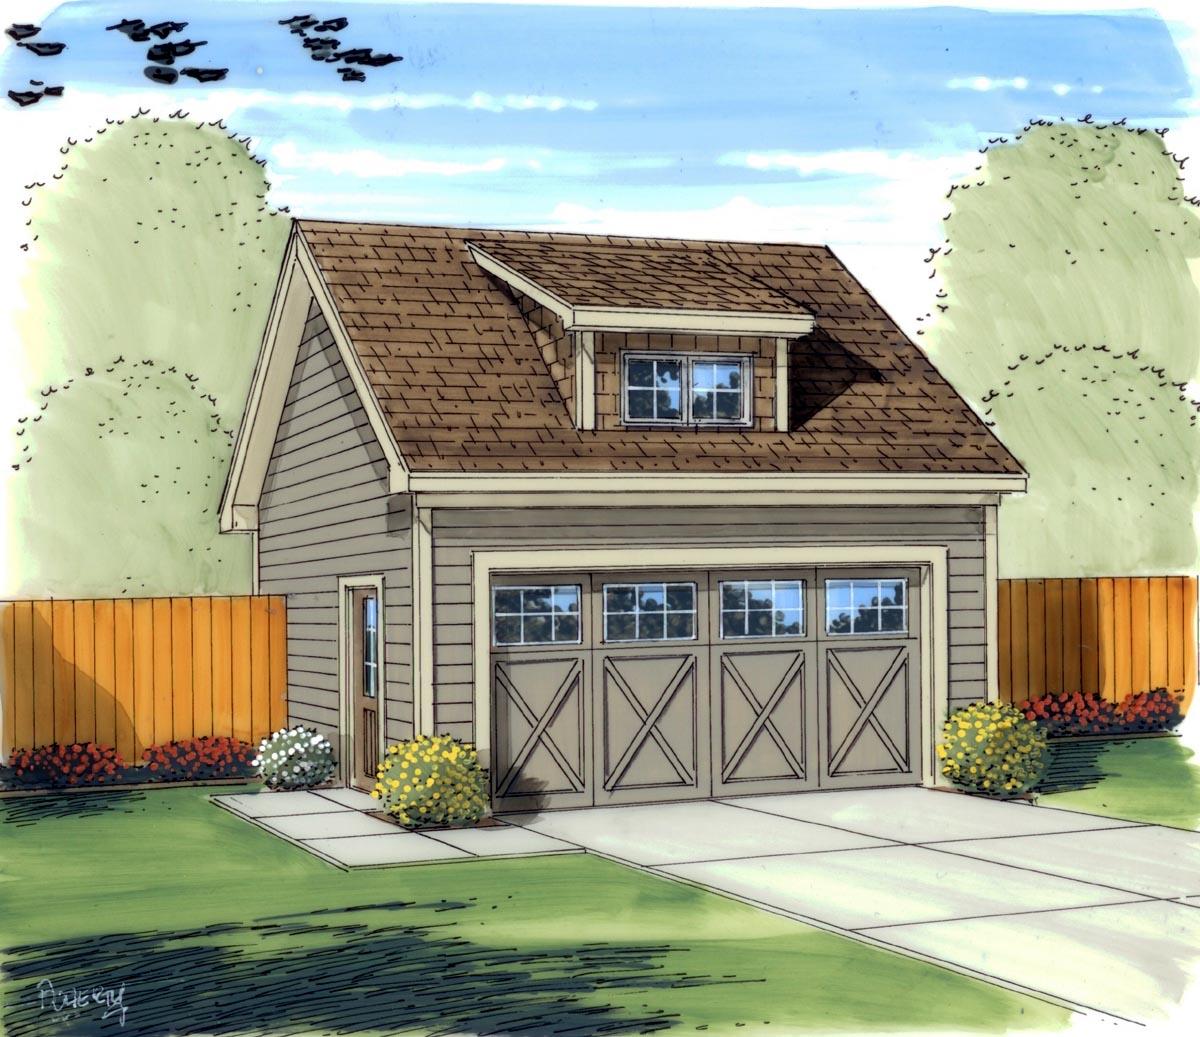 Garage Plan 95826 At Familyhomeplans Com: FamilyHomePlans.com